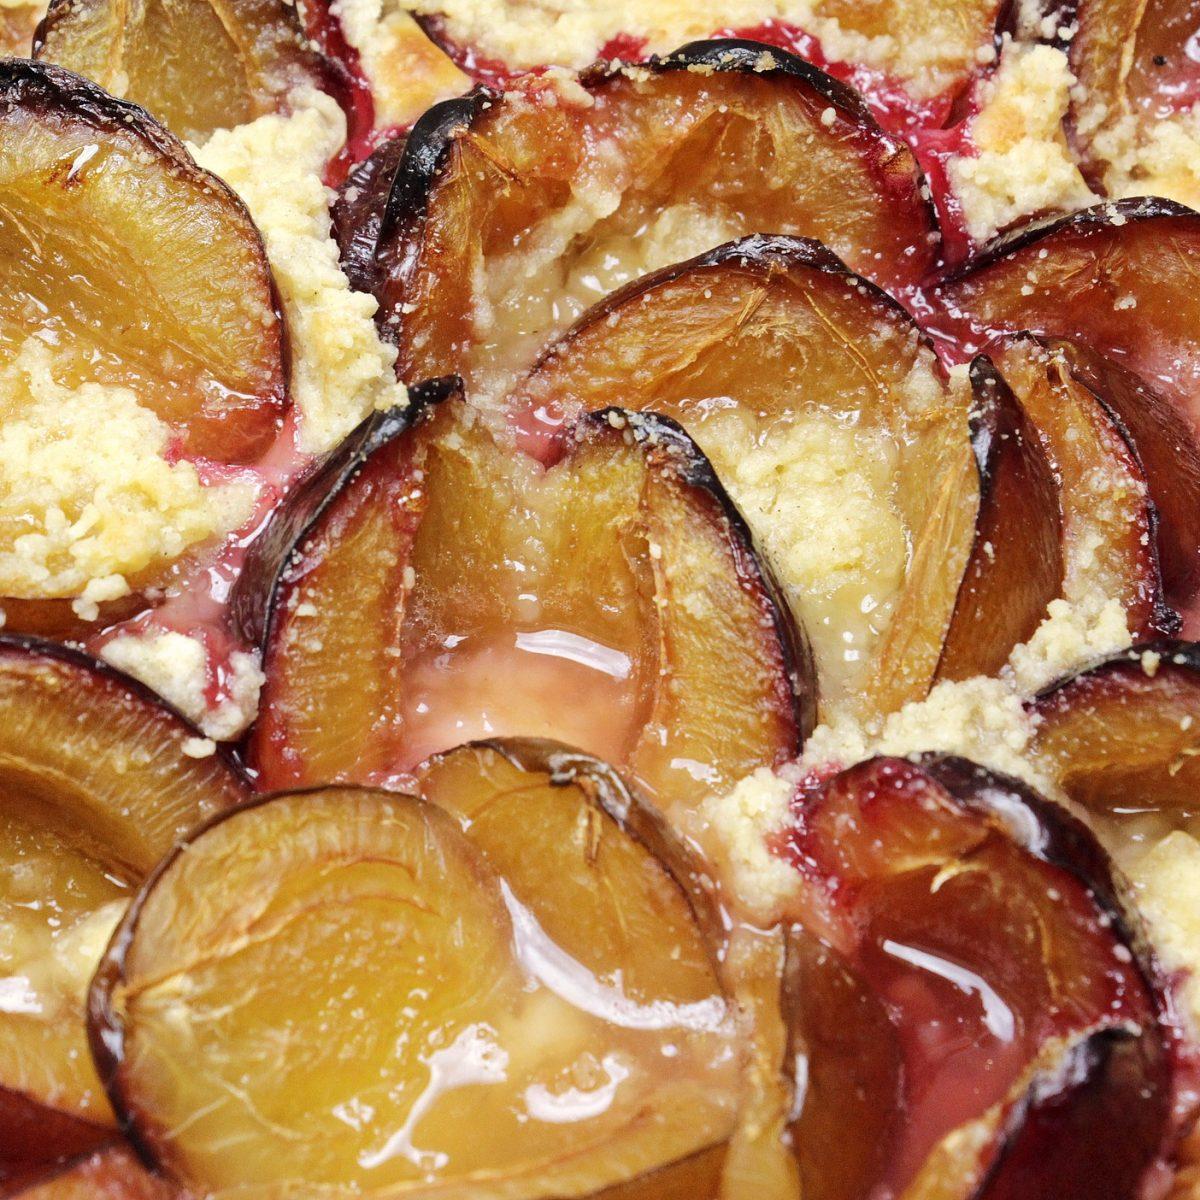 plums-3641851_1920